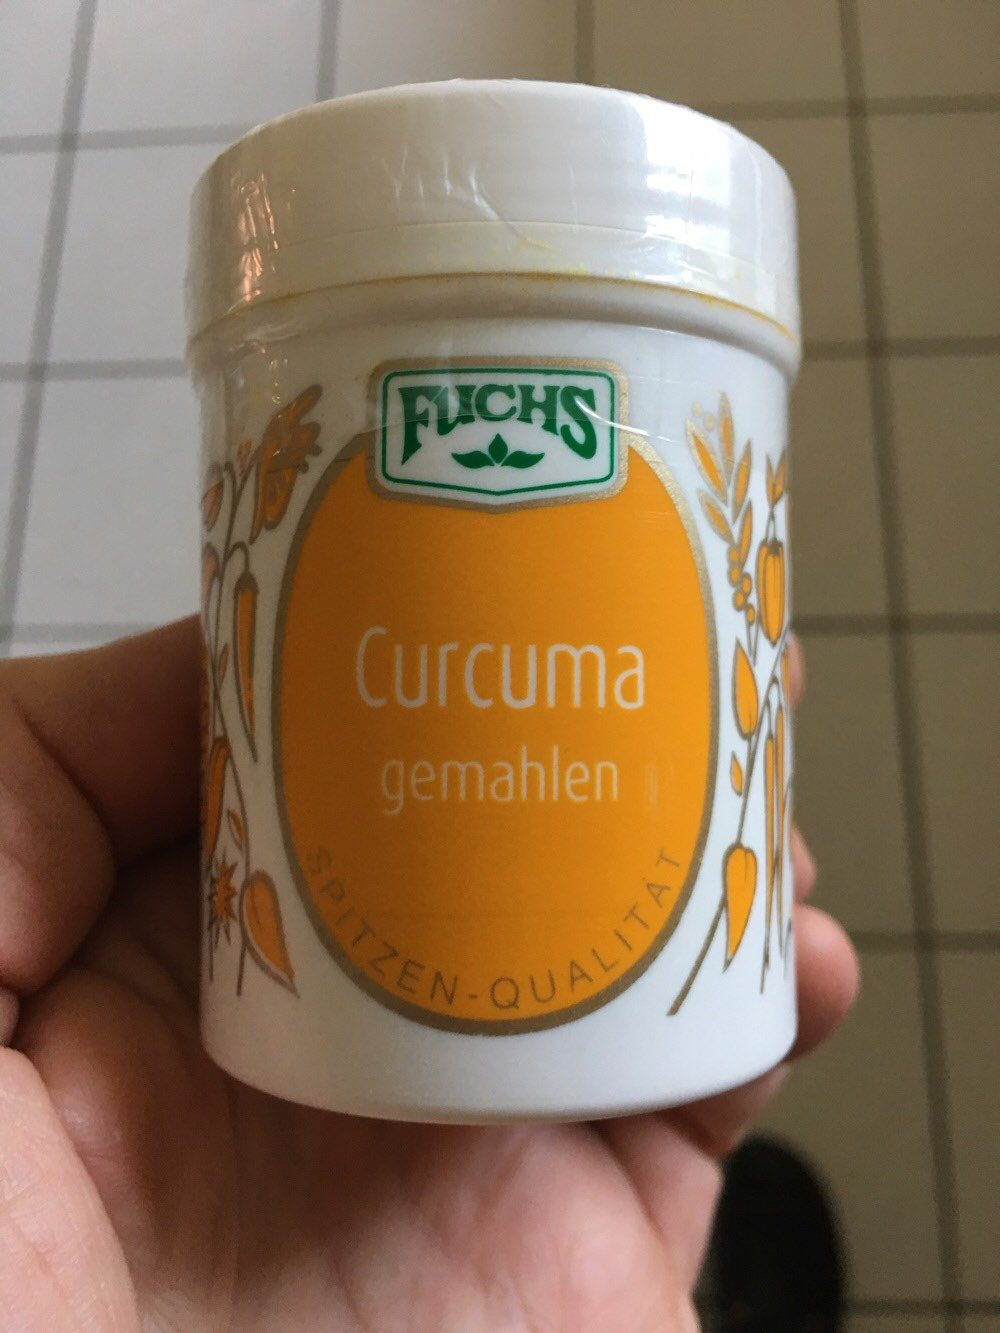 Curcuma gemahlen Fuchs - Product